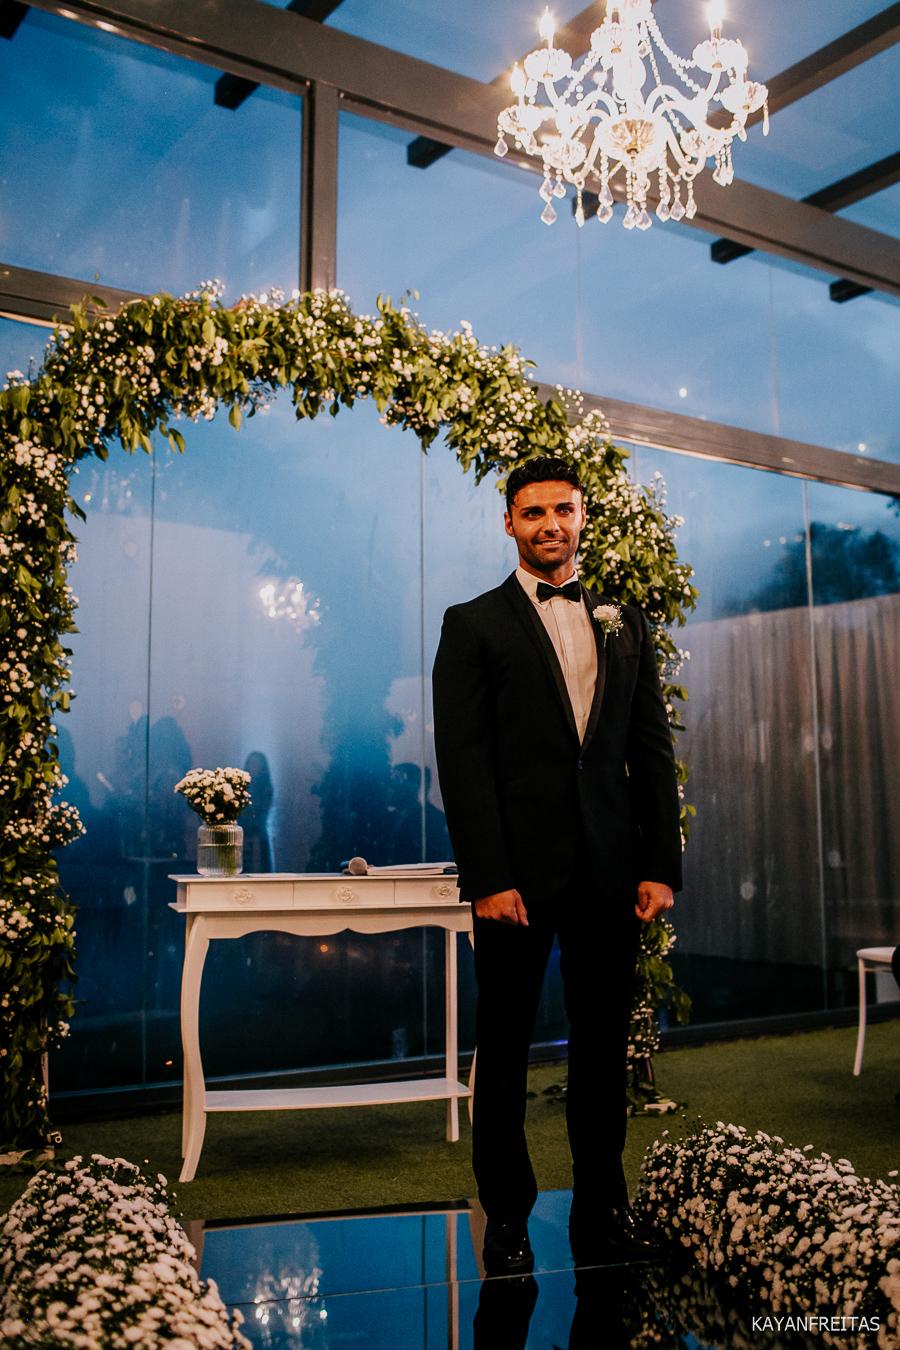 casamento-indaia-floripa-0043 Casamento Indaiá Florianópolis - Deise e Dário